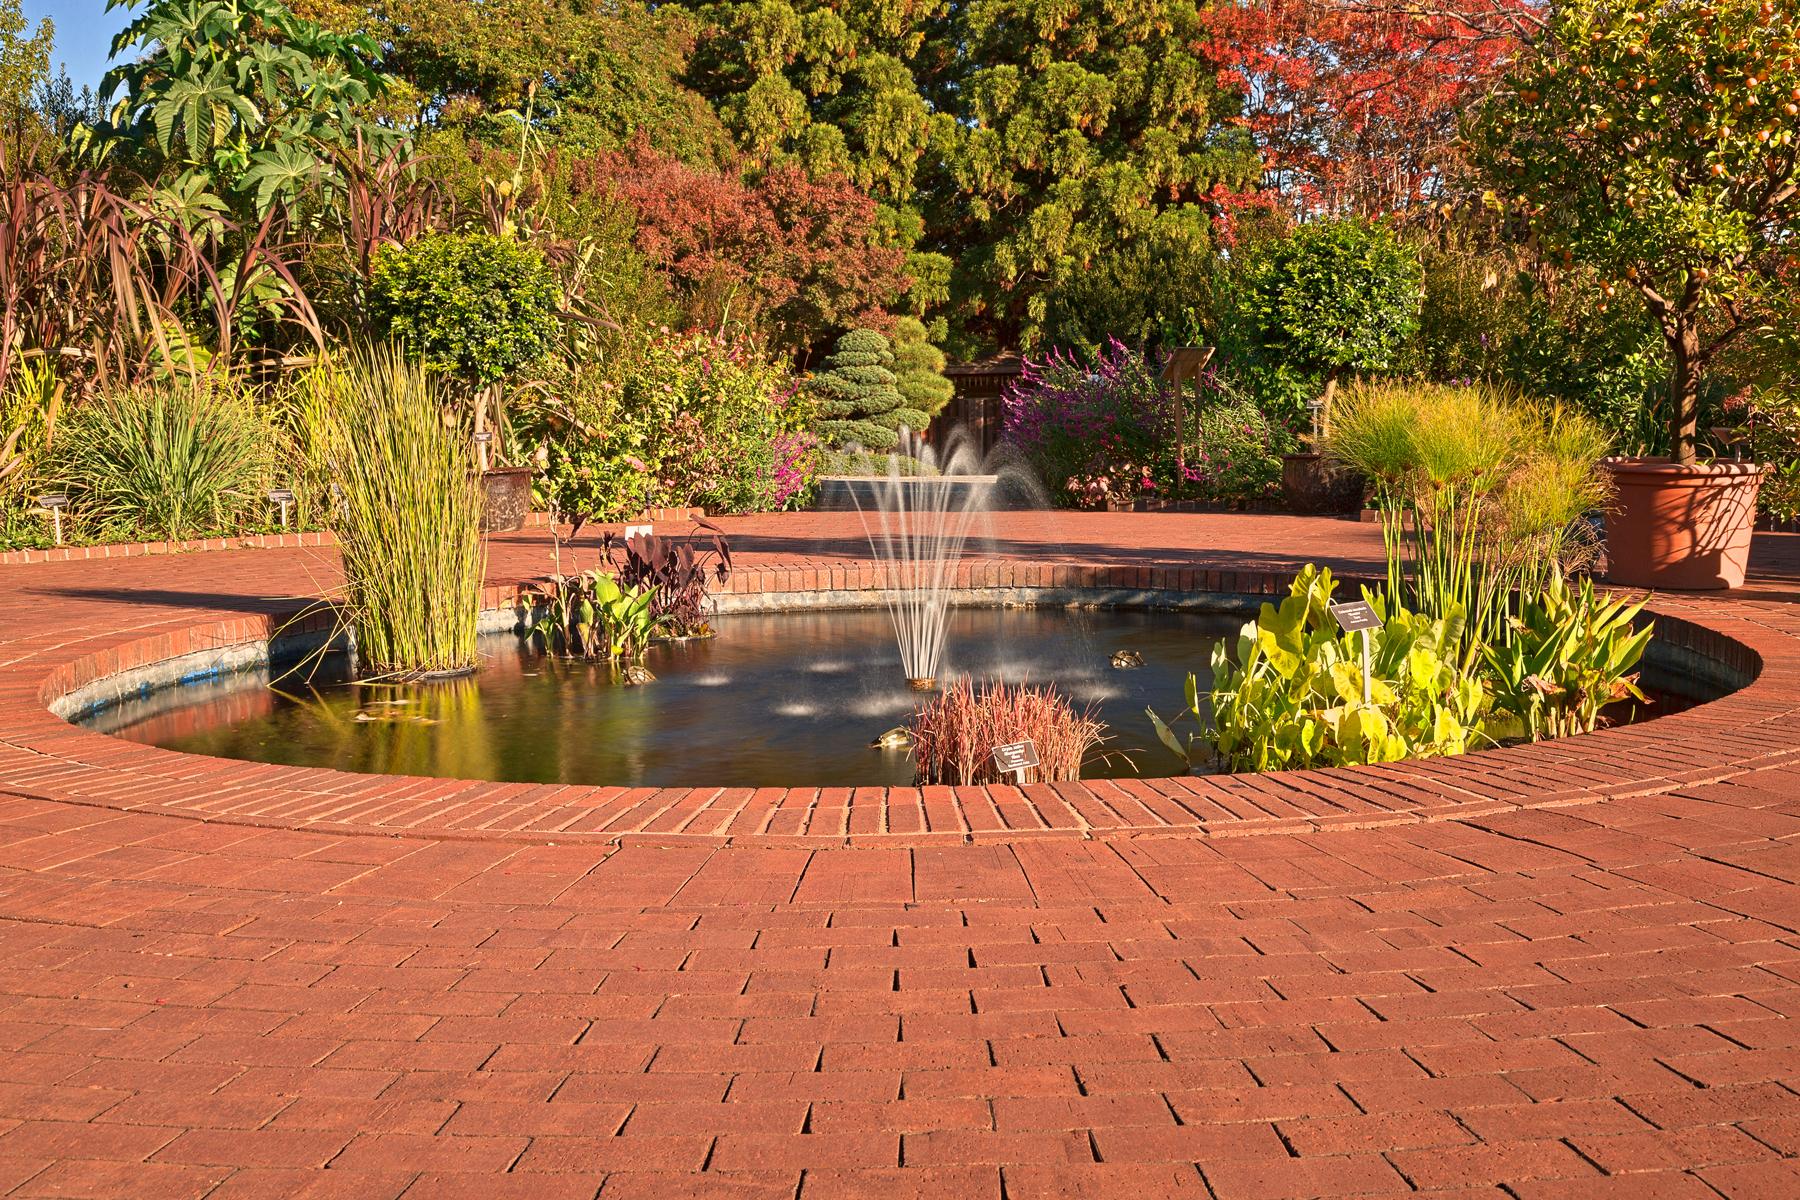 Autumn Arboretum Fountain - HDR, , Pretty, Purple, Quiet, HQ Photo